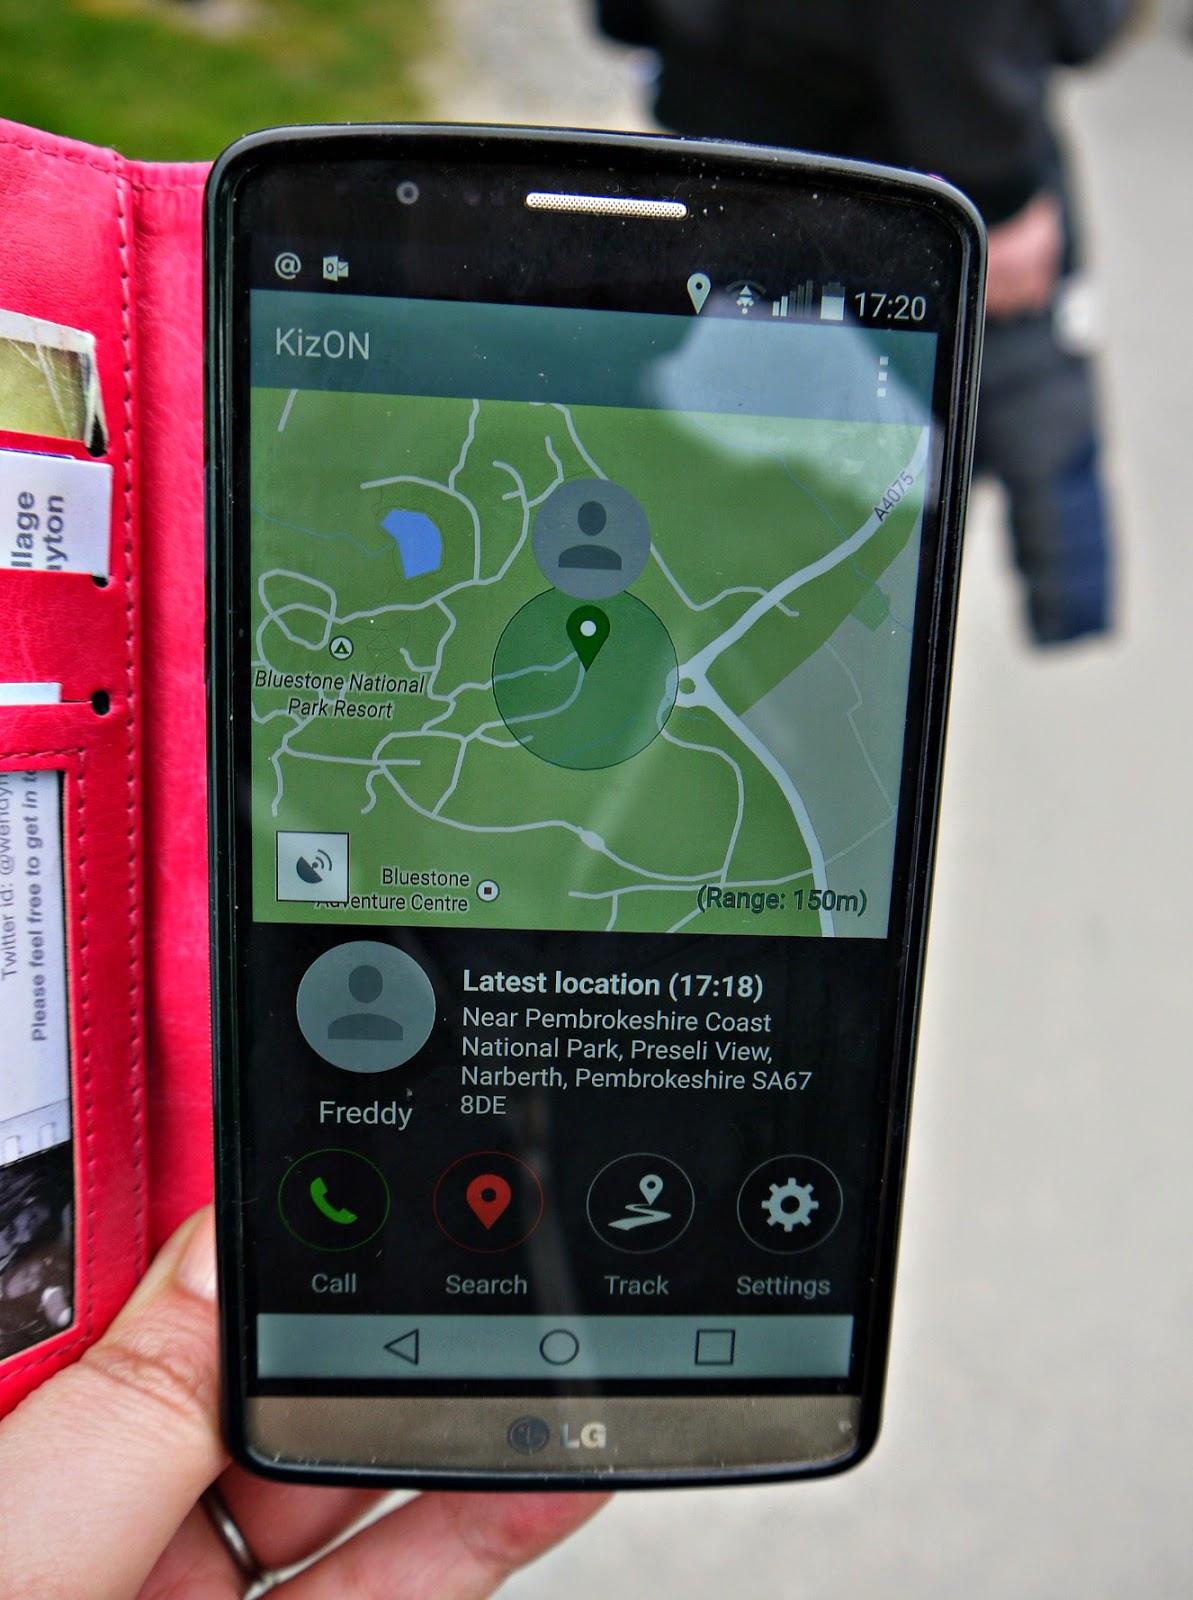 LG KizON, smartphone, app